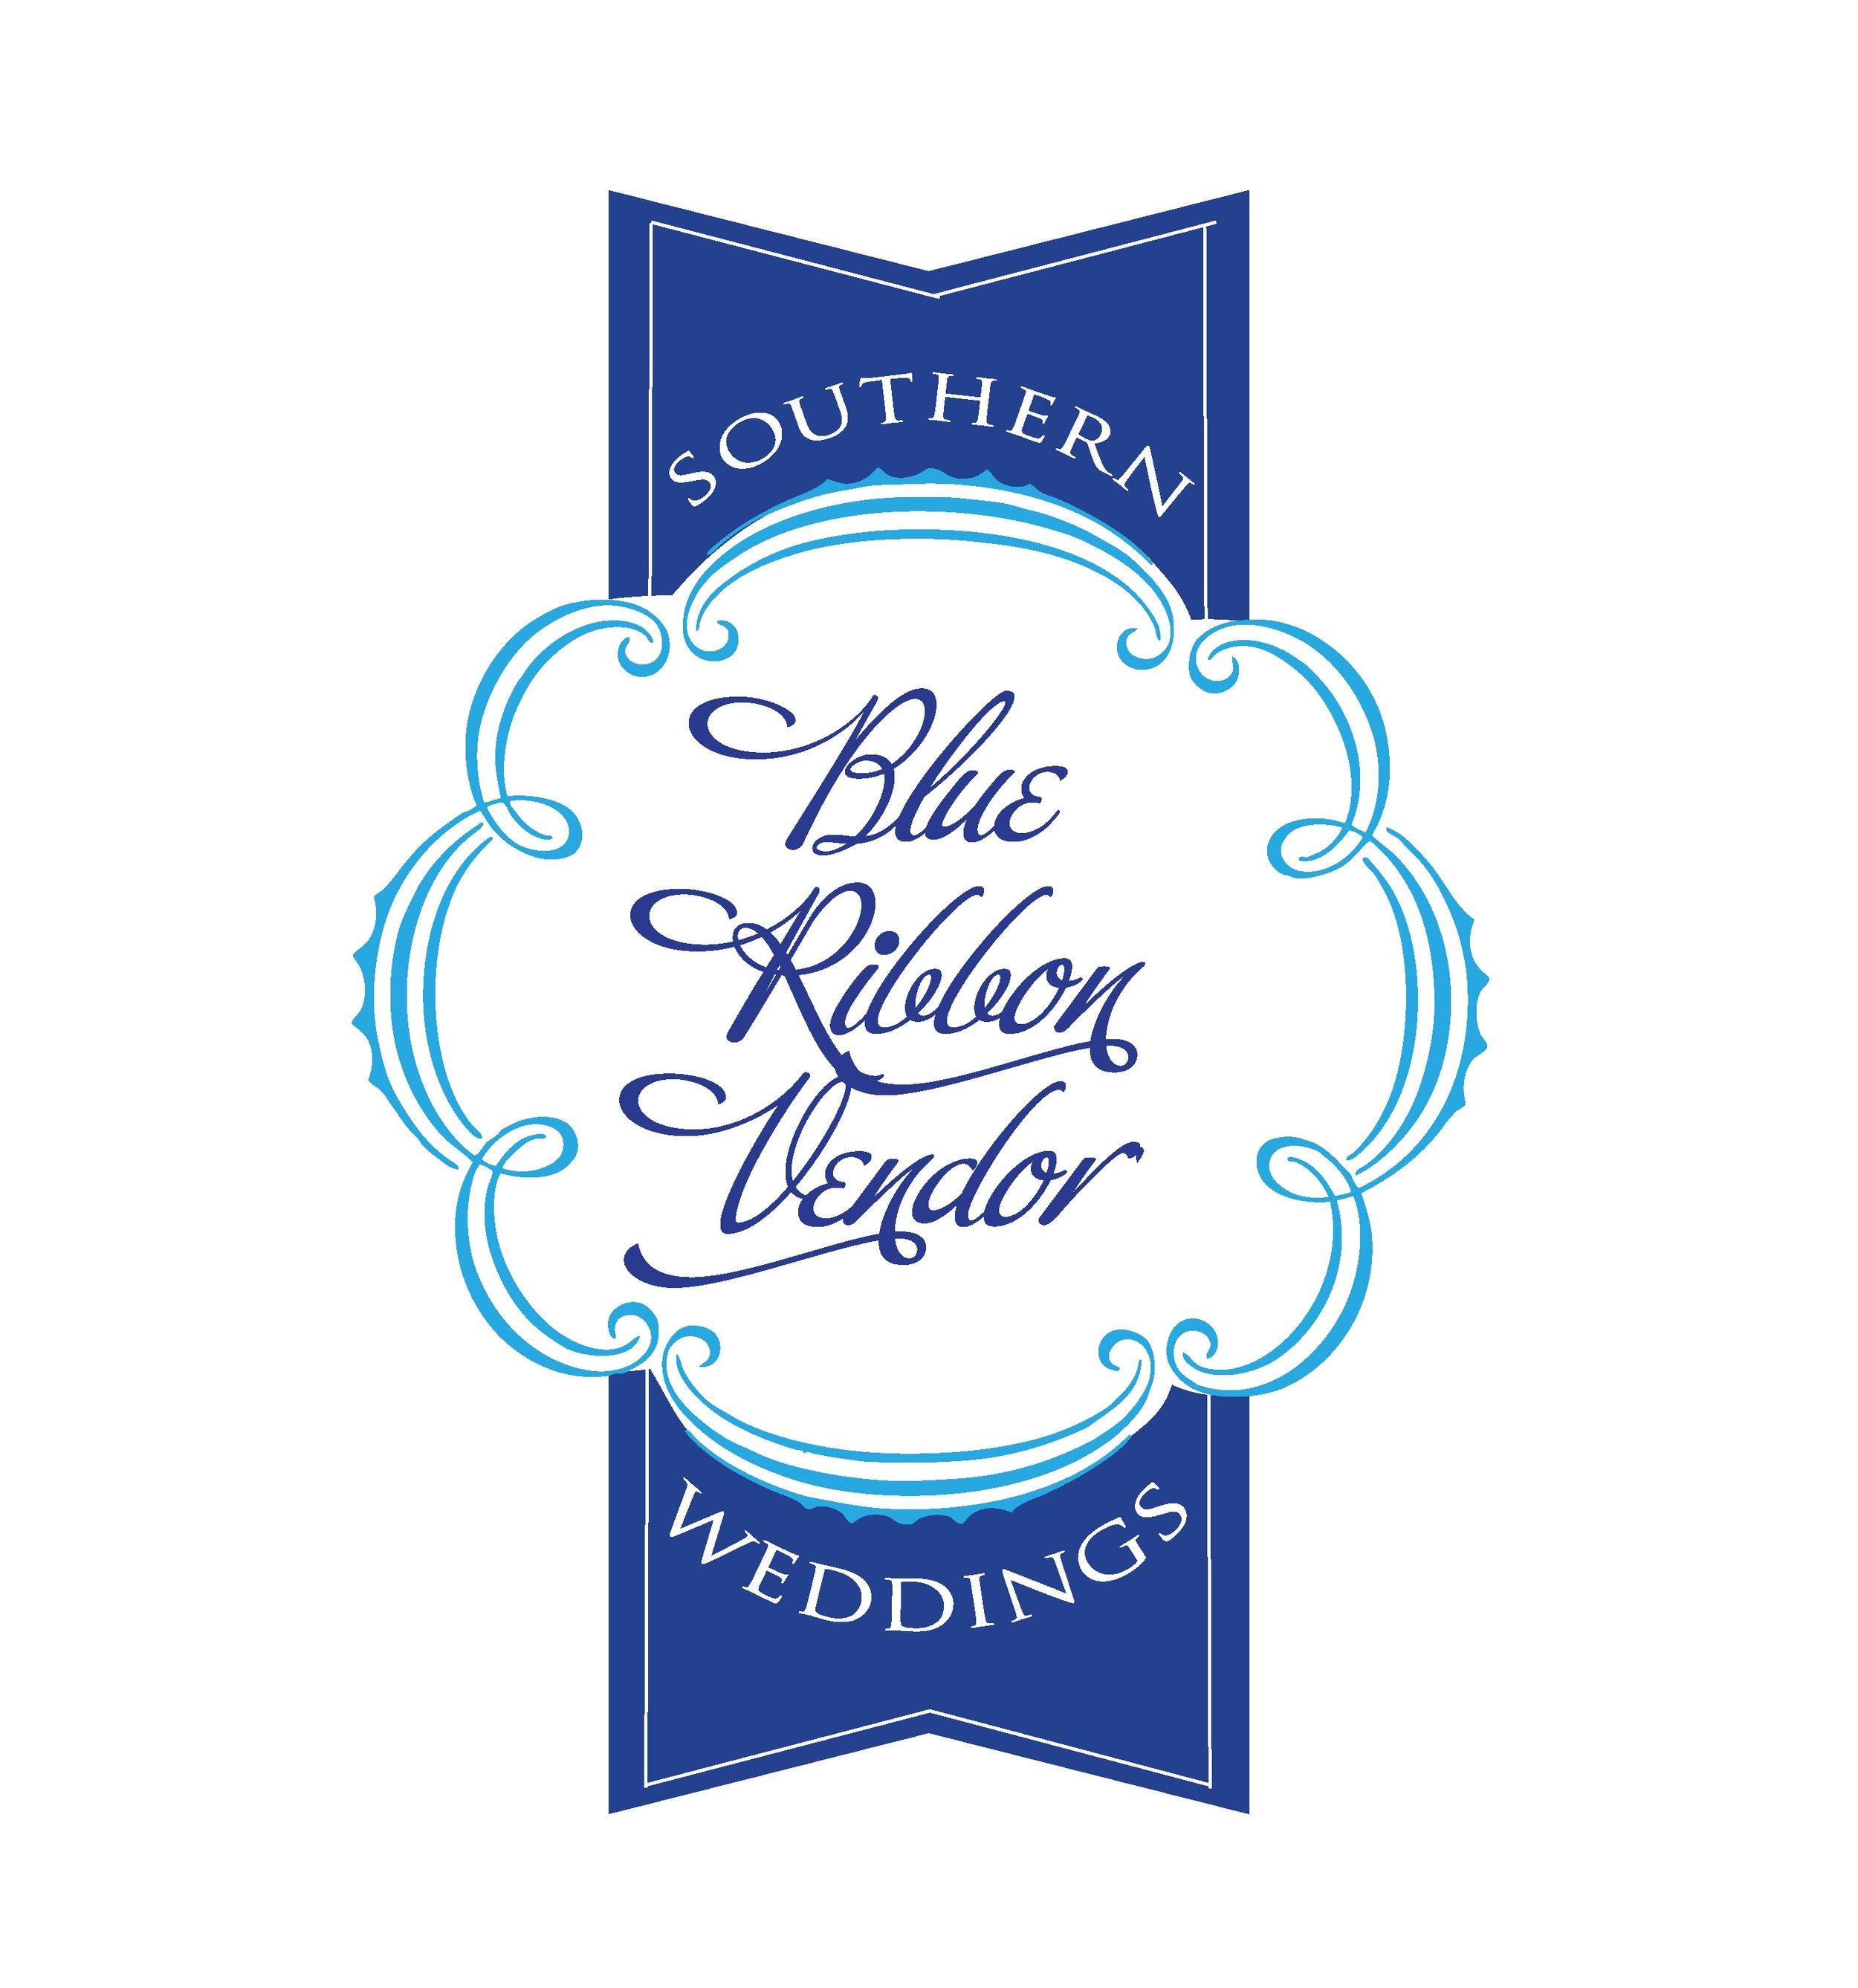 Southern Weddings Blue Ribbon Vendor Florida Wedding Photographer